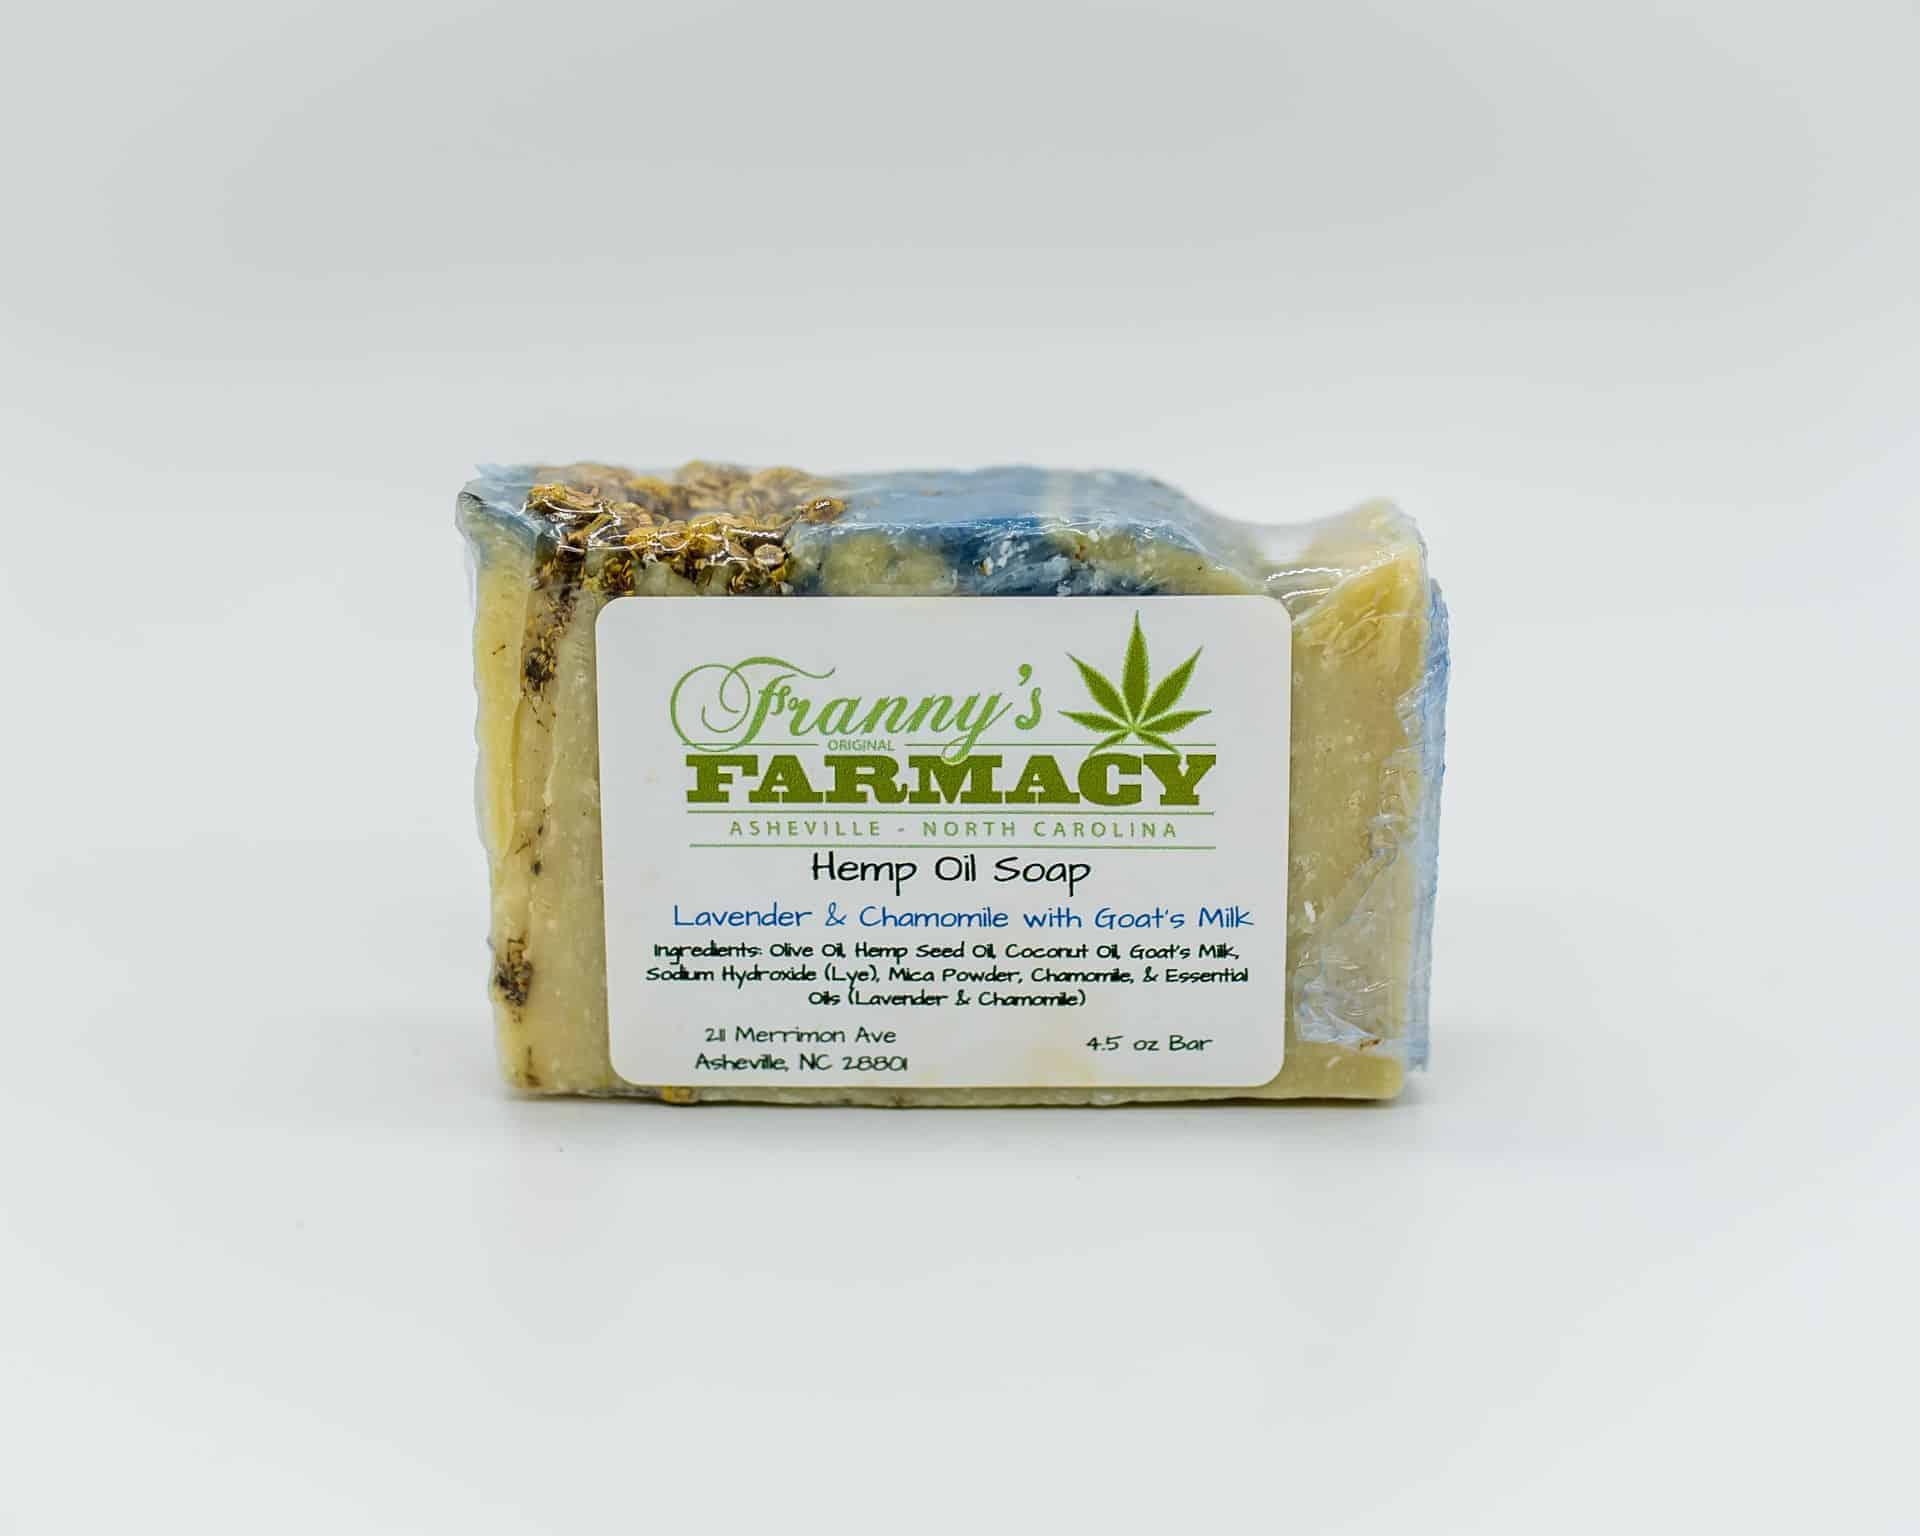 Franny's Farmacy Lavender and Chamomile Hemp Oil Soap